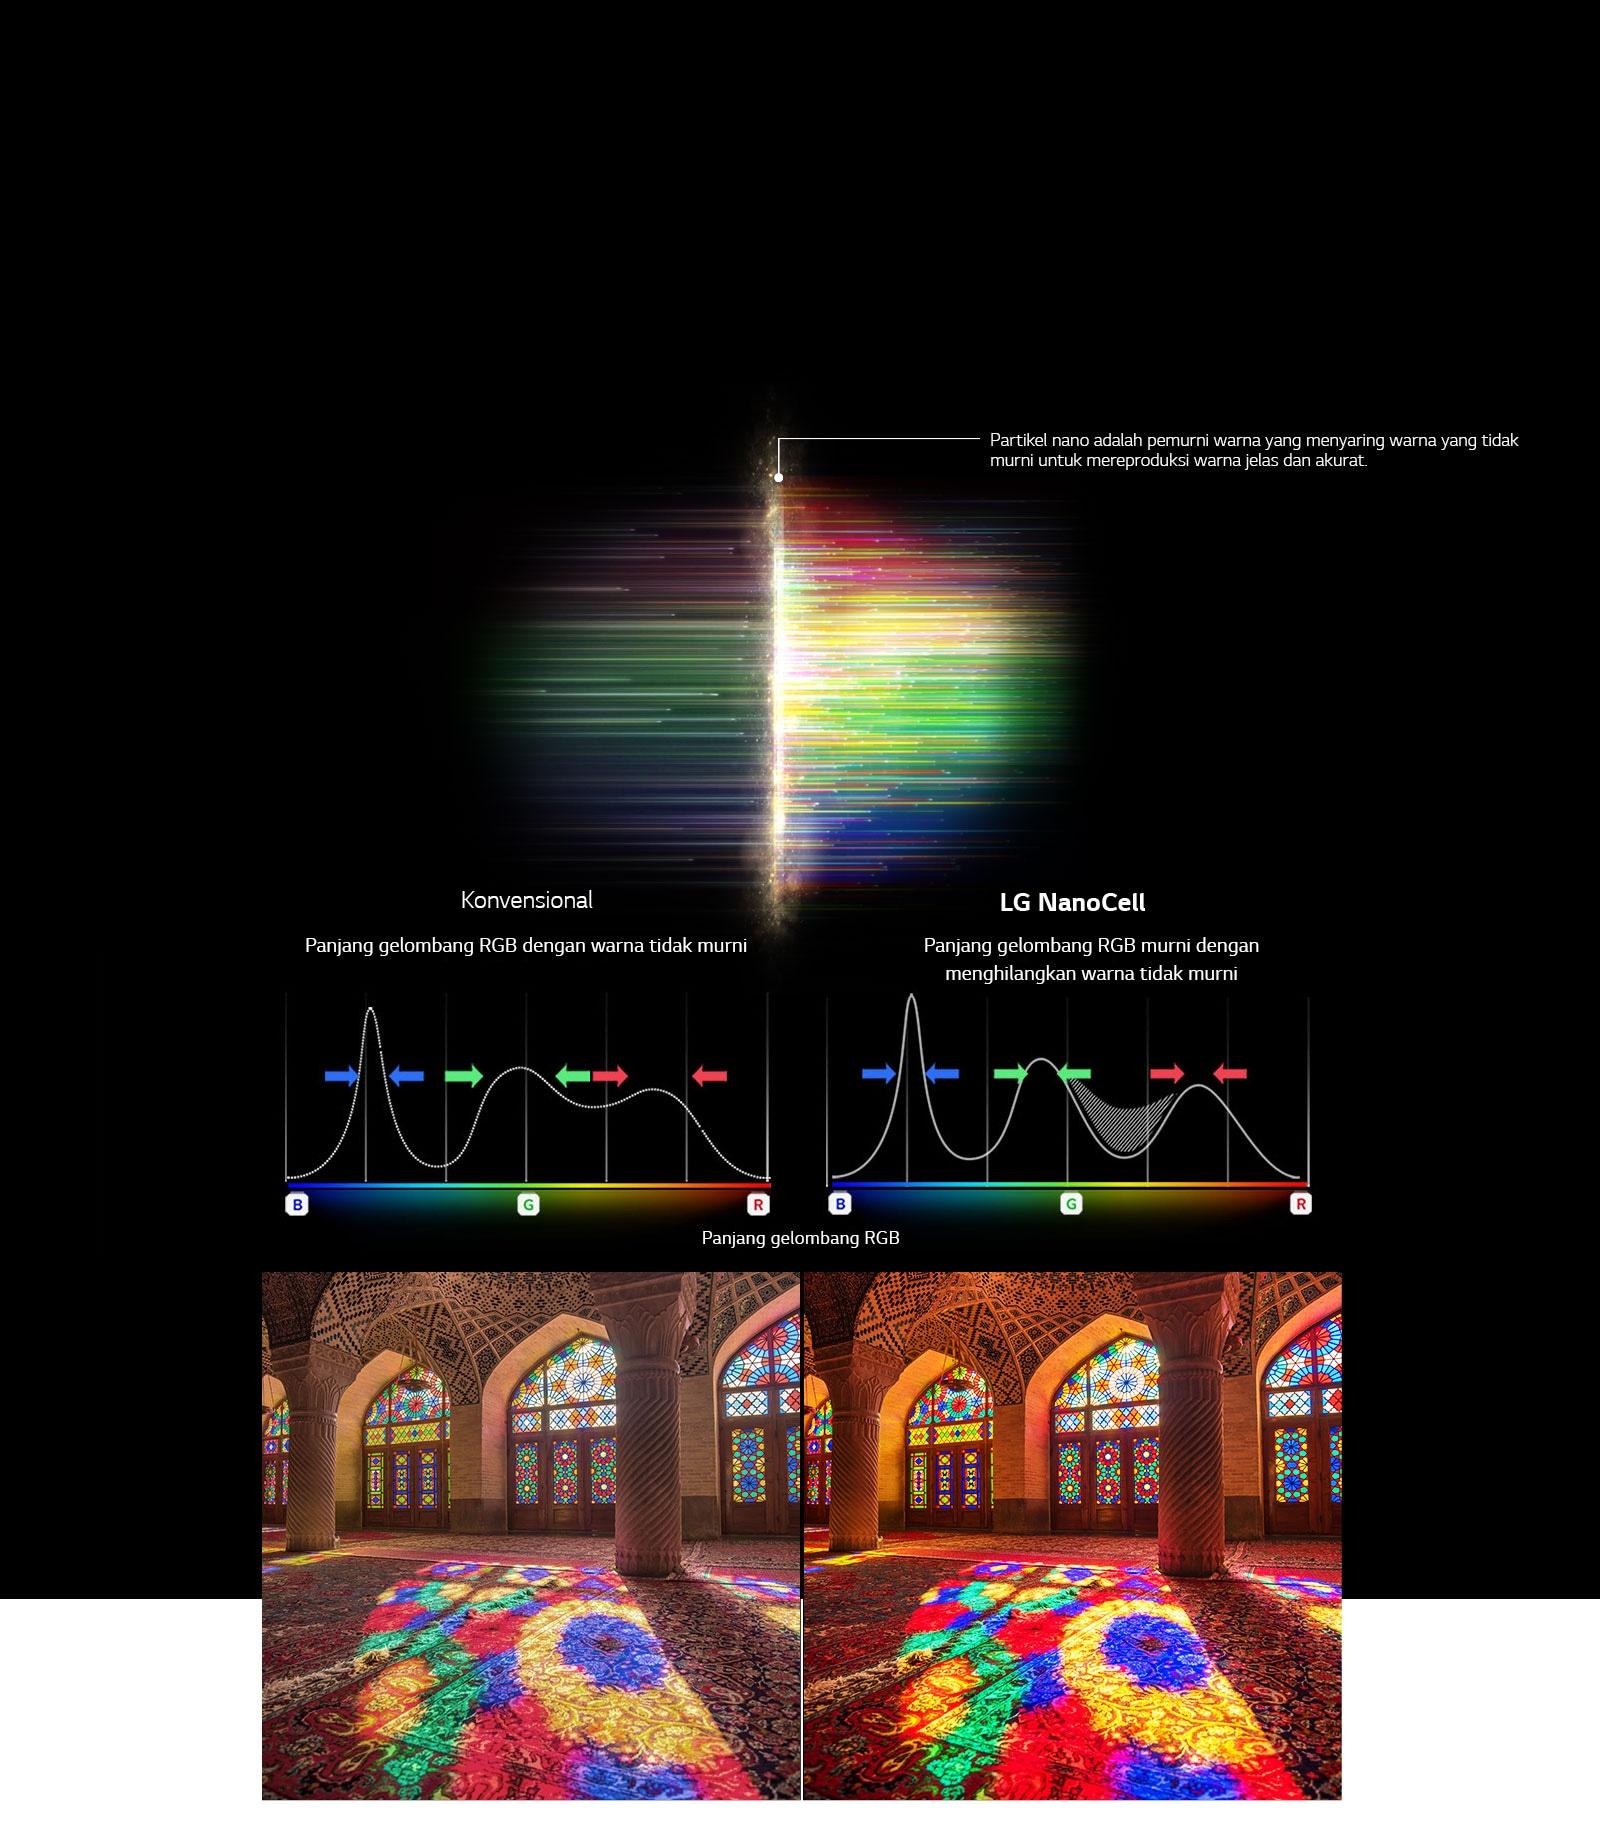 Grafis spektrum RGB yang menunjukkan hasil penyaringan warna kusan dan gambar perbandingan Warna Murni antara TV konvensional dan teknologi NanoCell